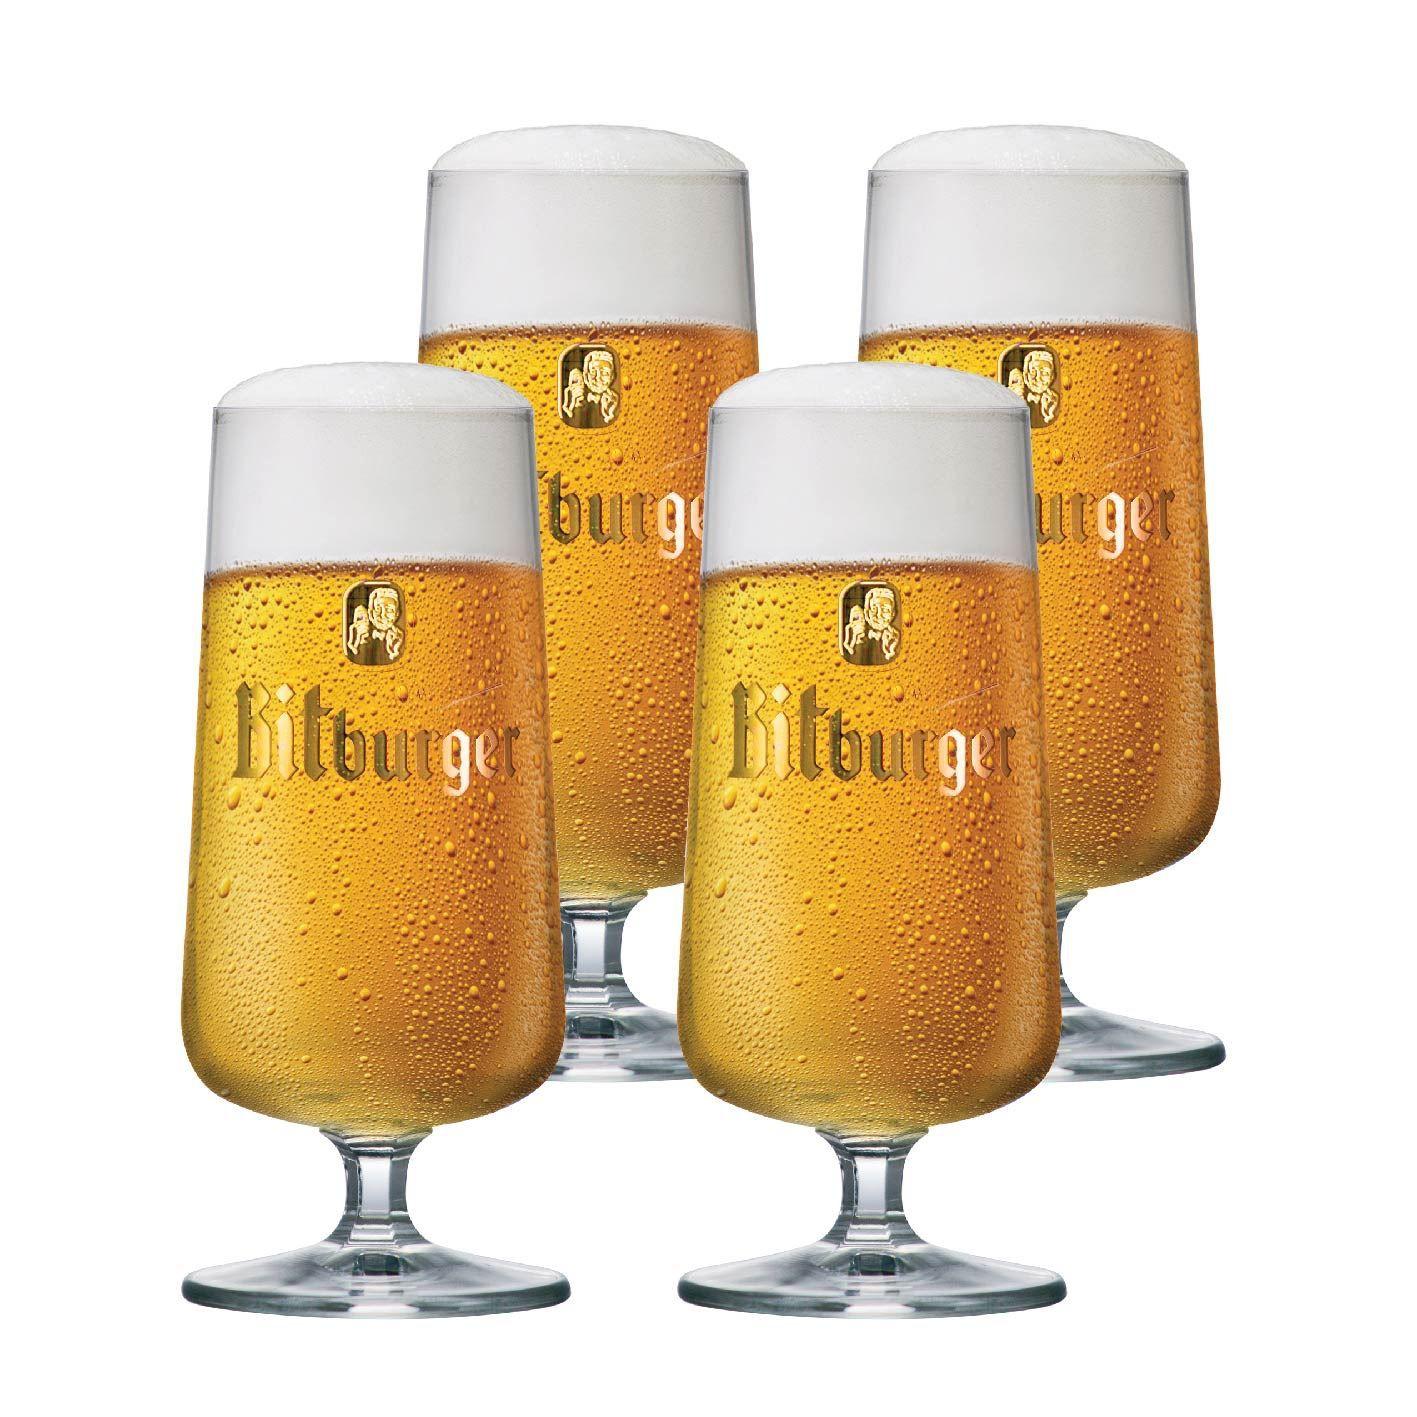 Jogo de Taças de Cerveja Bitburger Cristal 370ml 4 Pcs